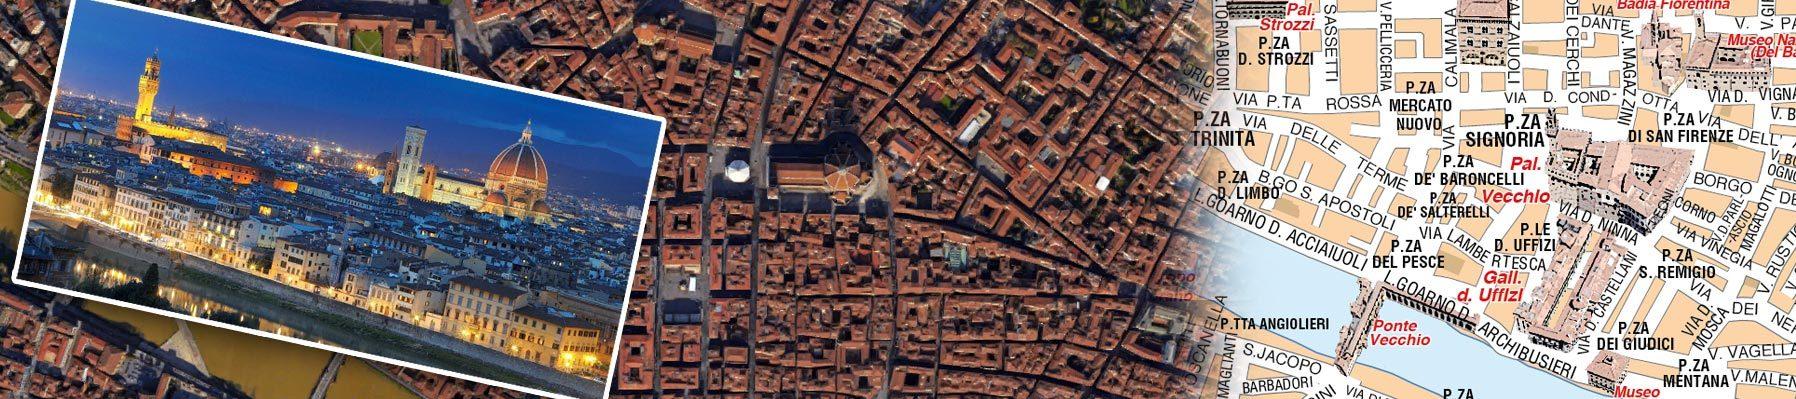 Cartina Di Firenze Centro Da Stampare.Mappa Di Firenze Cartografia Per La Stampa Professionale